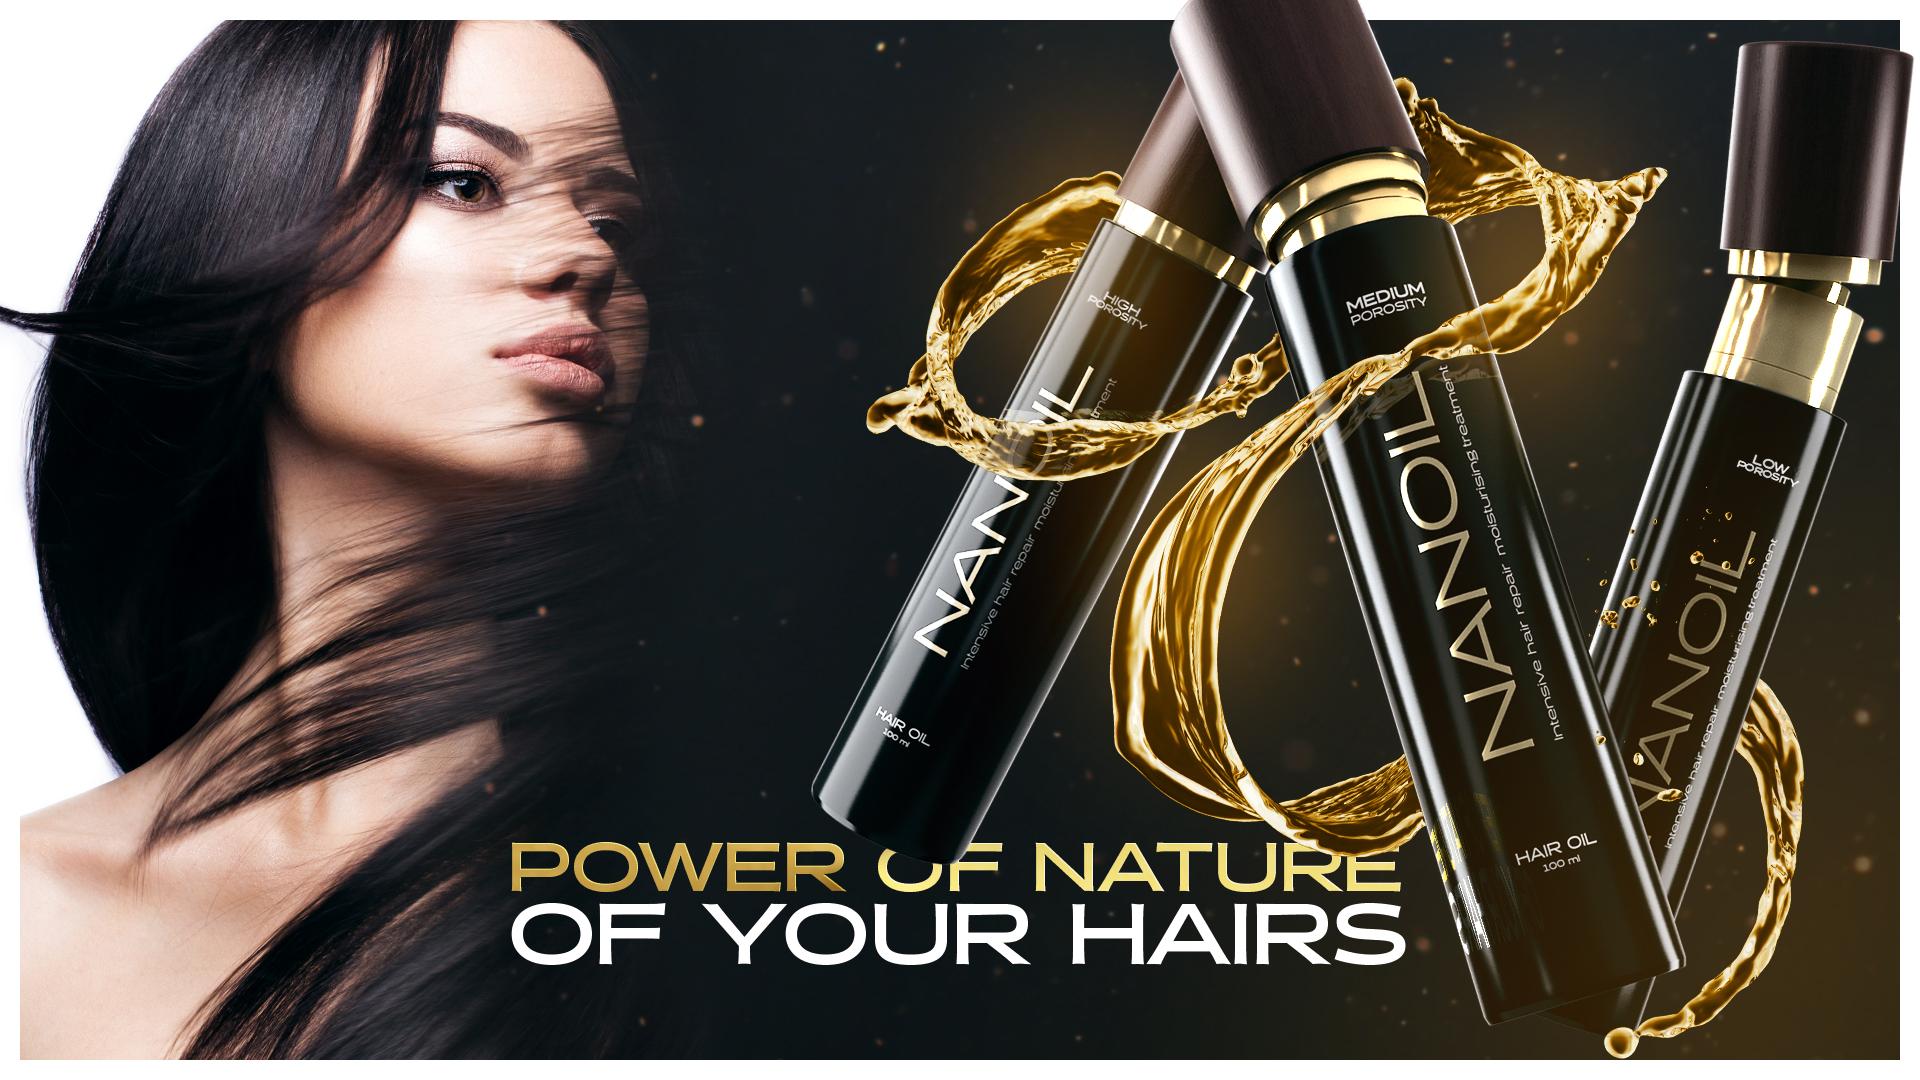 Three times YES for Nanoil hair oil